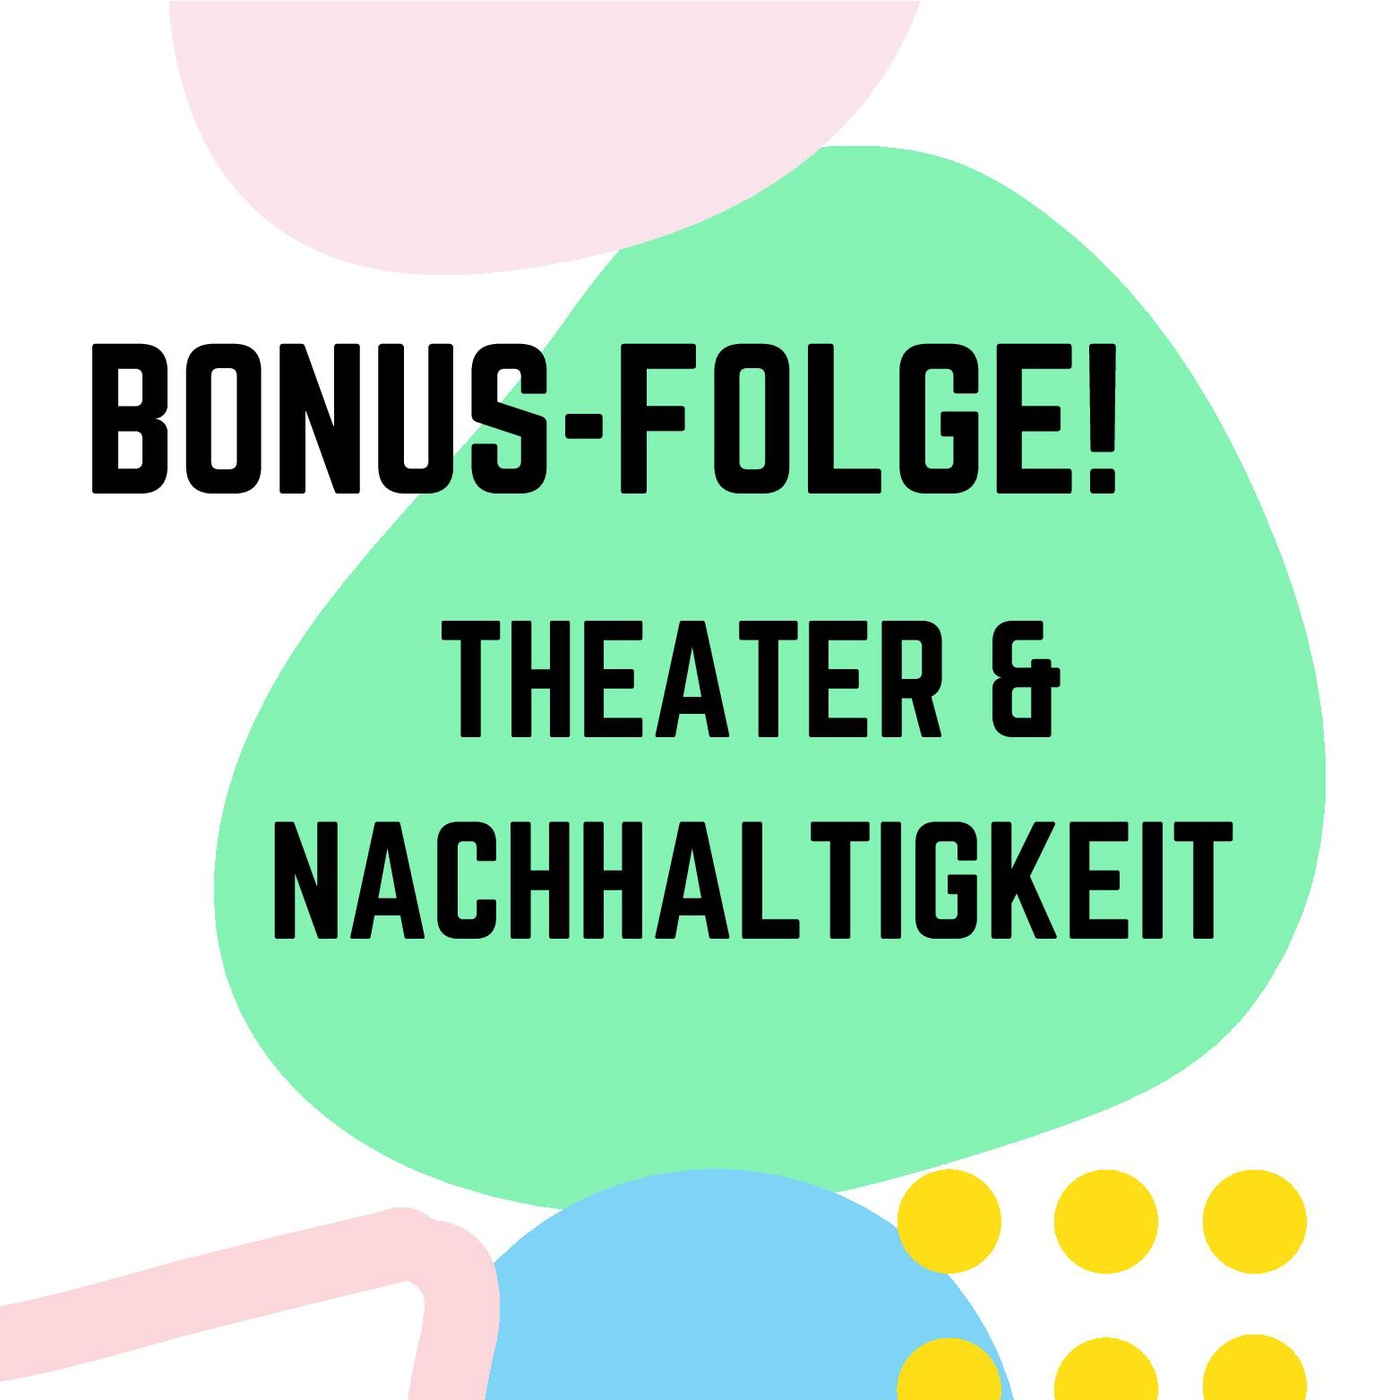 Bonus-Folge: Theater & Nachhaltigkeit